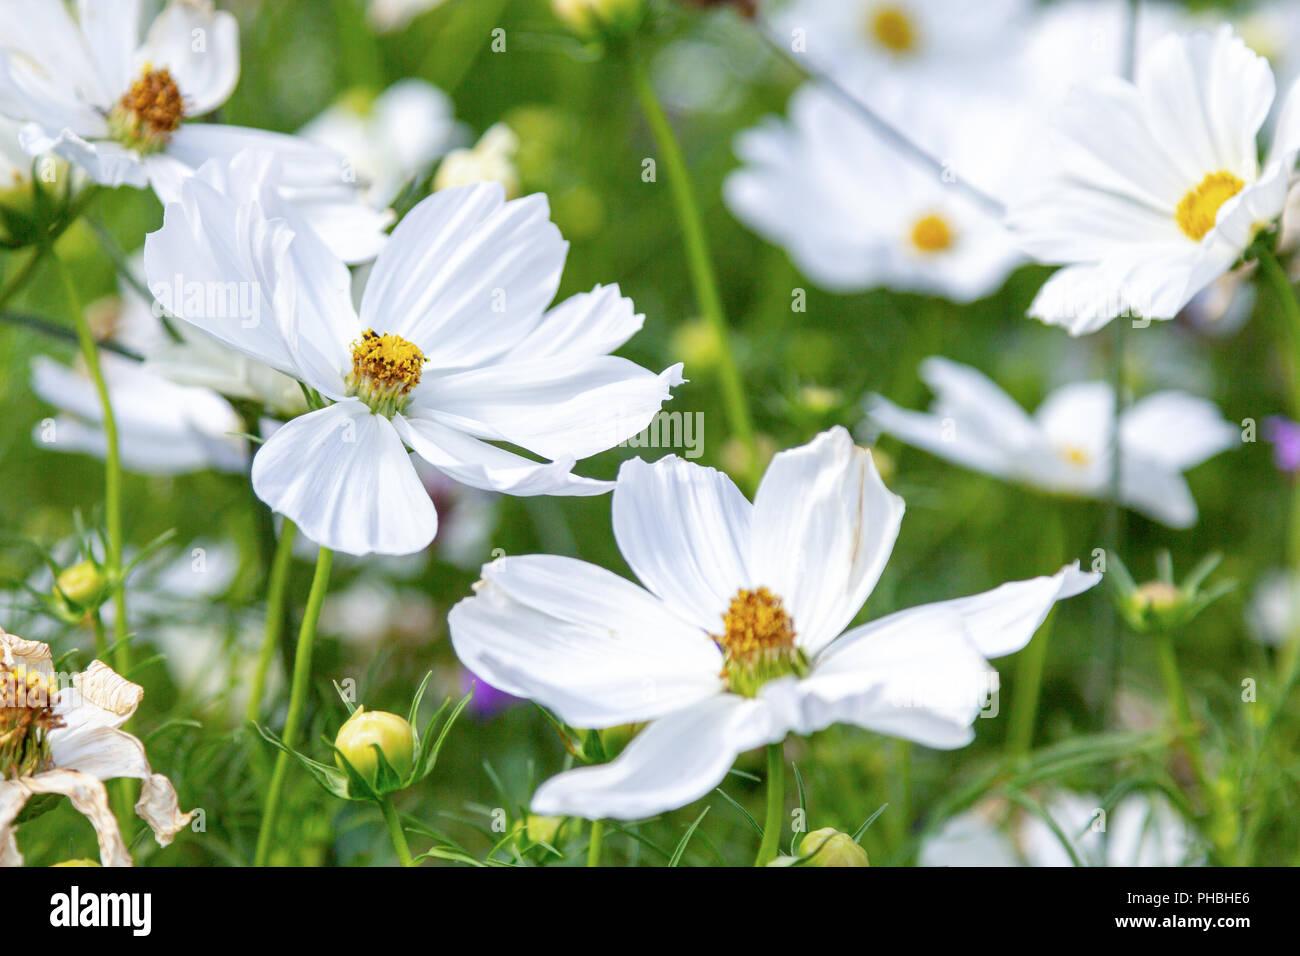 White garden cosmos flower in a bed of flowers stock photo white garden cosmos flower in a bed of flowers mightylinksfo